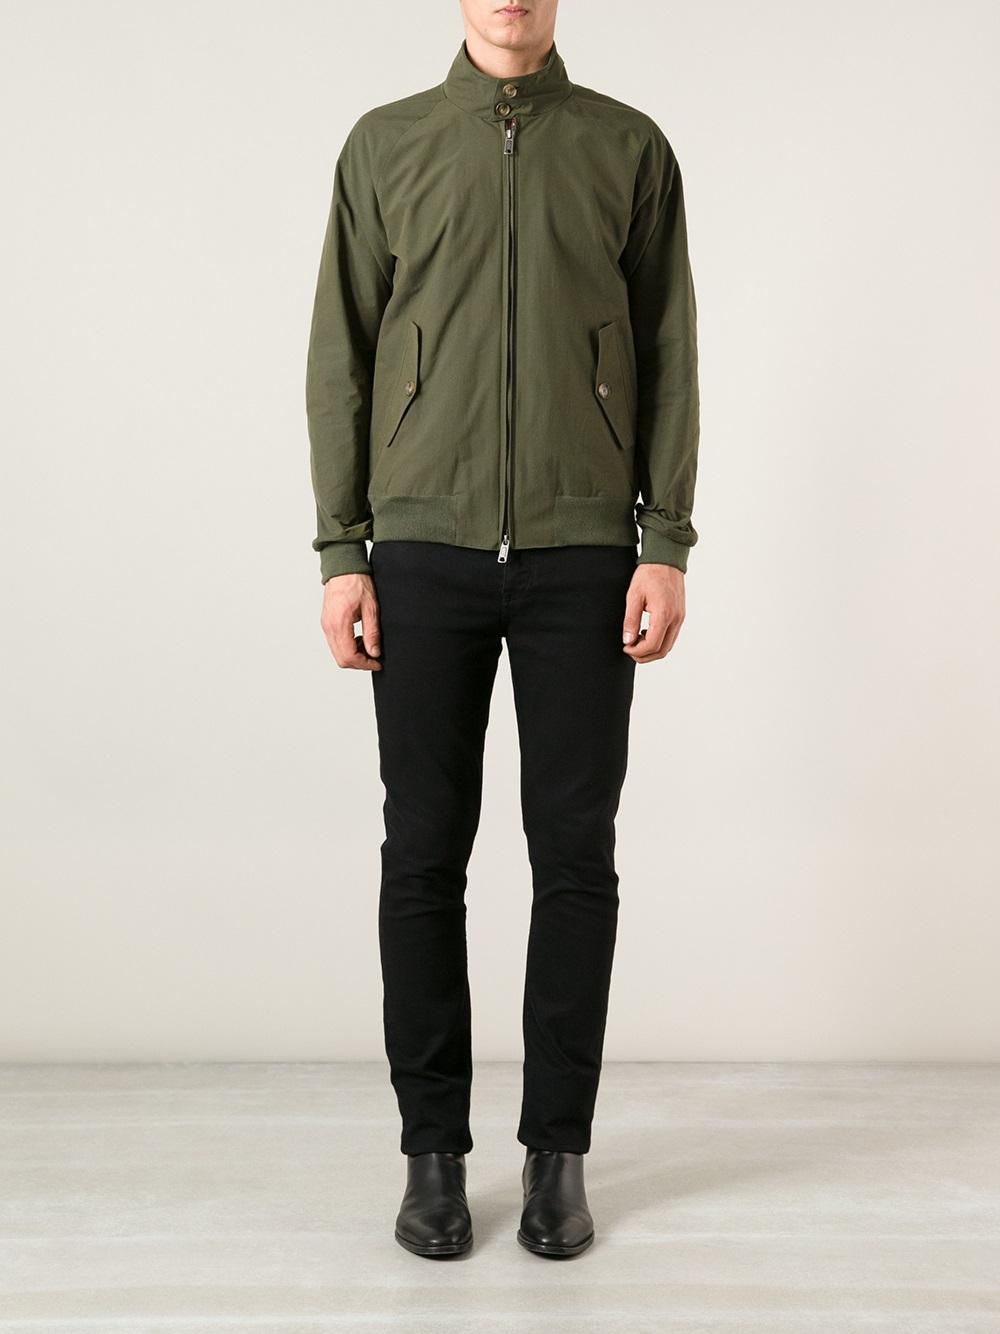 Lyst Baracuta G9 Harrington Jacket In Green For Men